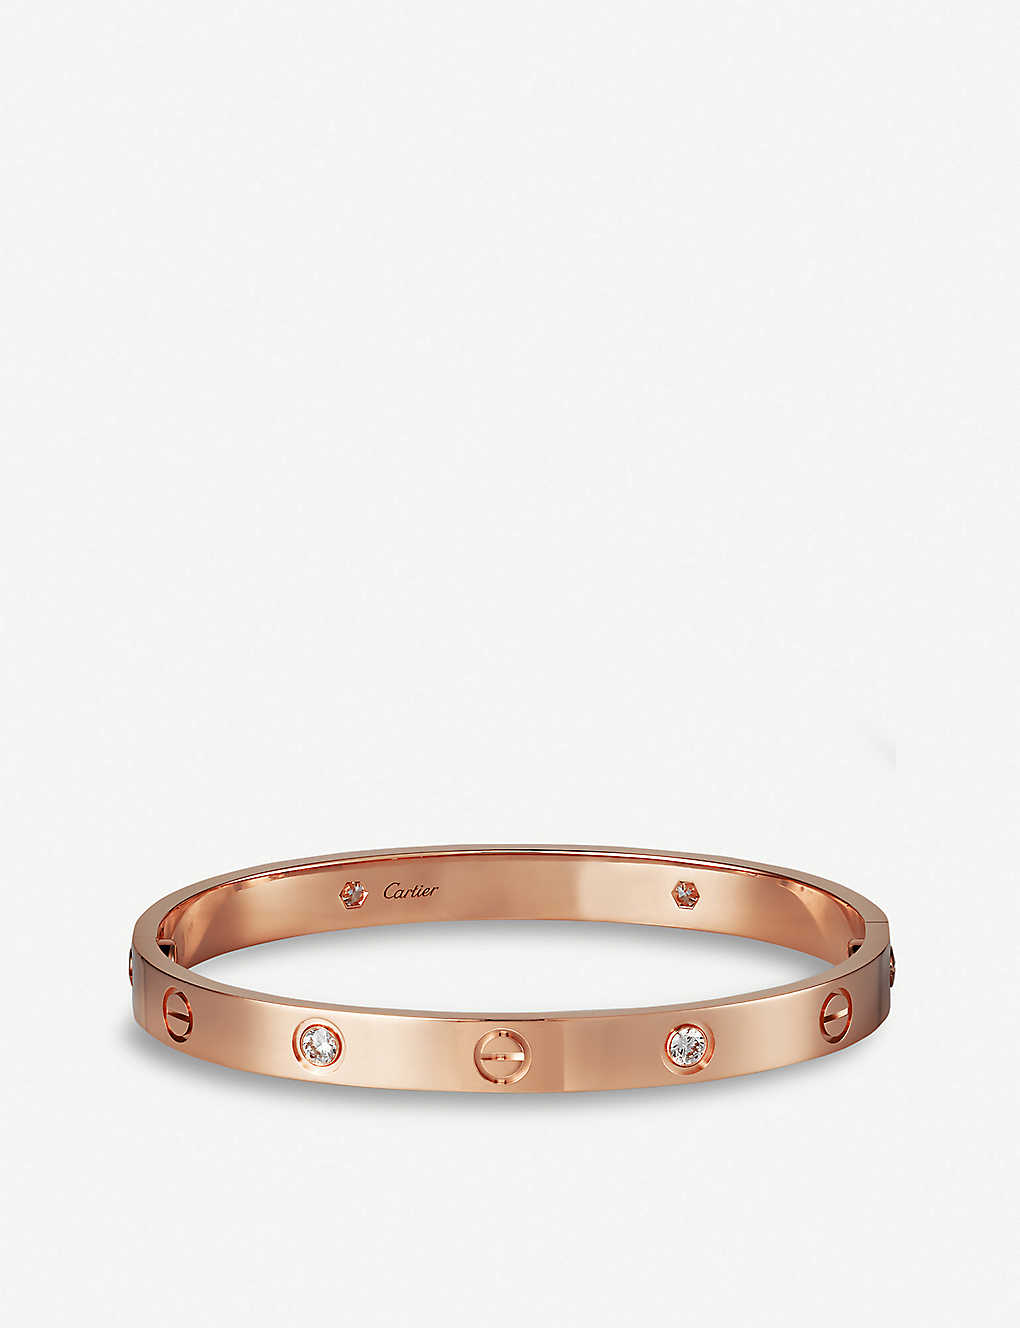 1f826d95a CARTIER - Love 18ct rose-gold and diamonds bracelet | Selfridges.com